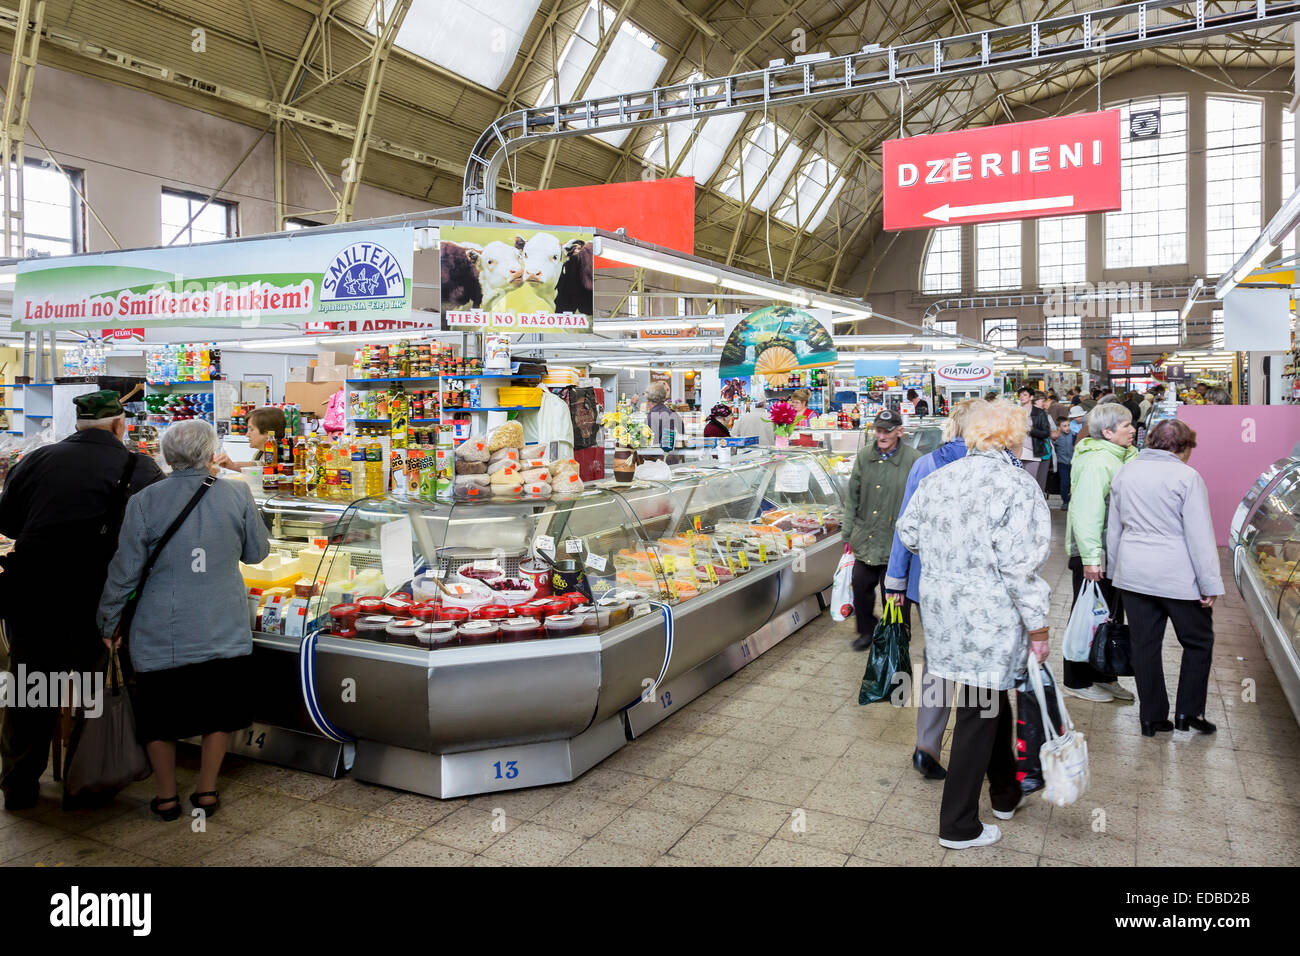 Steht in der Market Hall, Rigaer Zentralmarkt, Riga, Lettland Stockbild